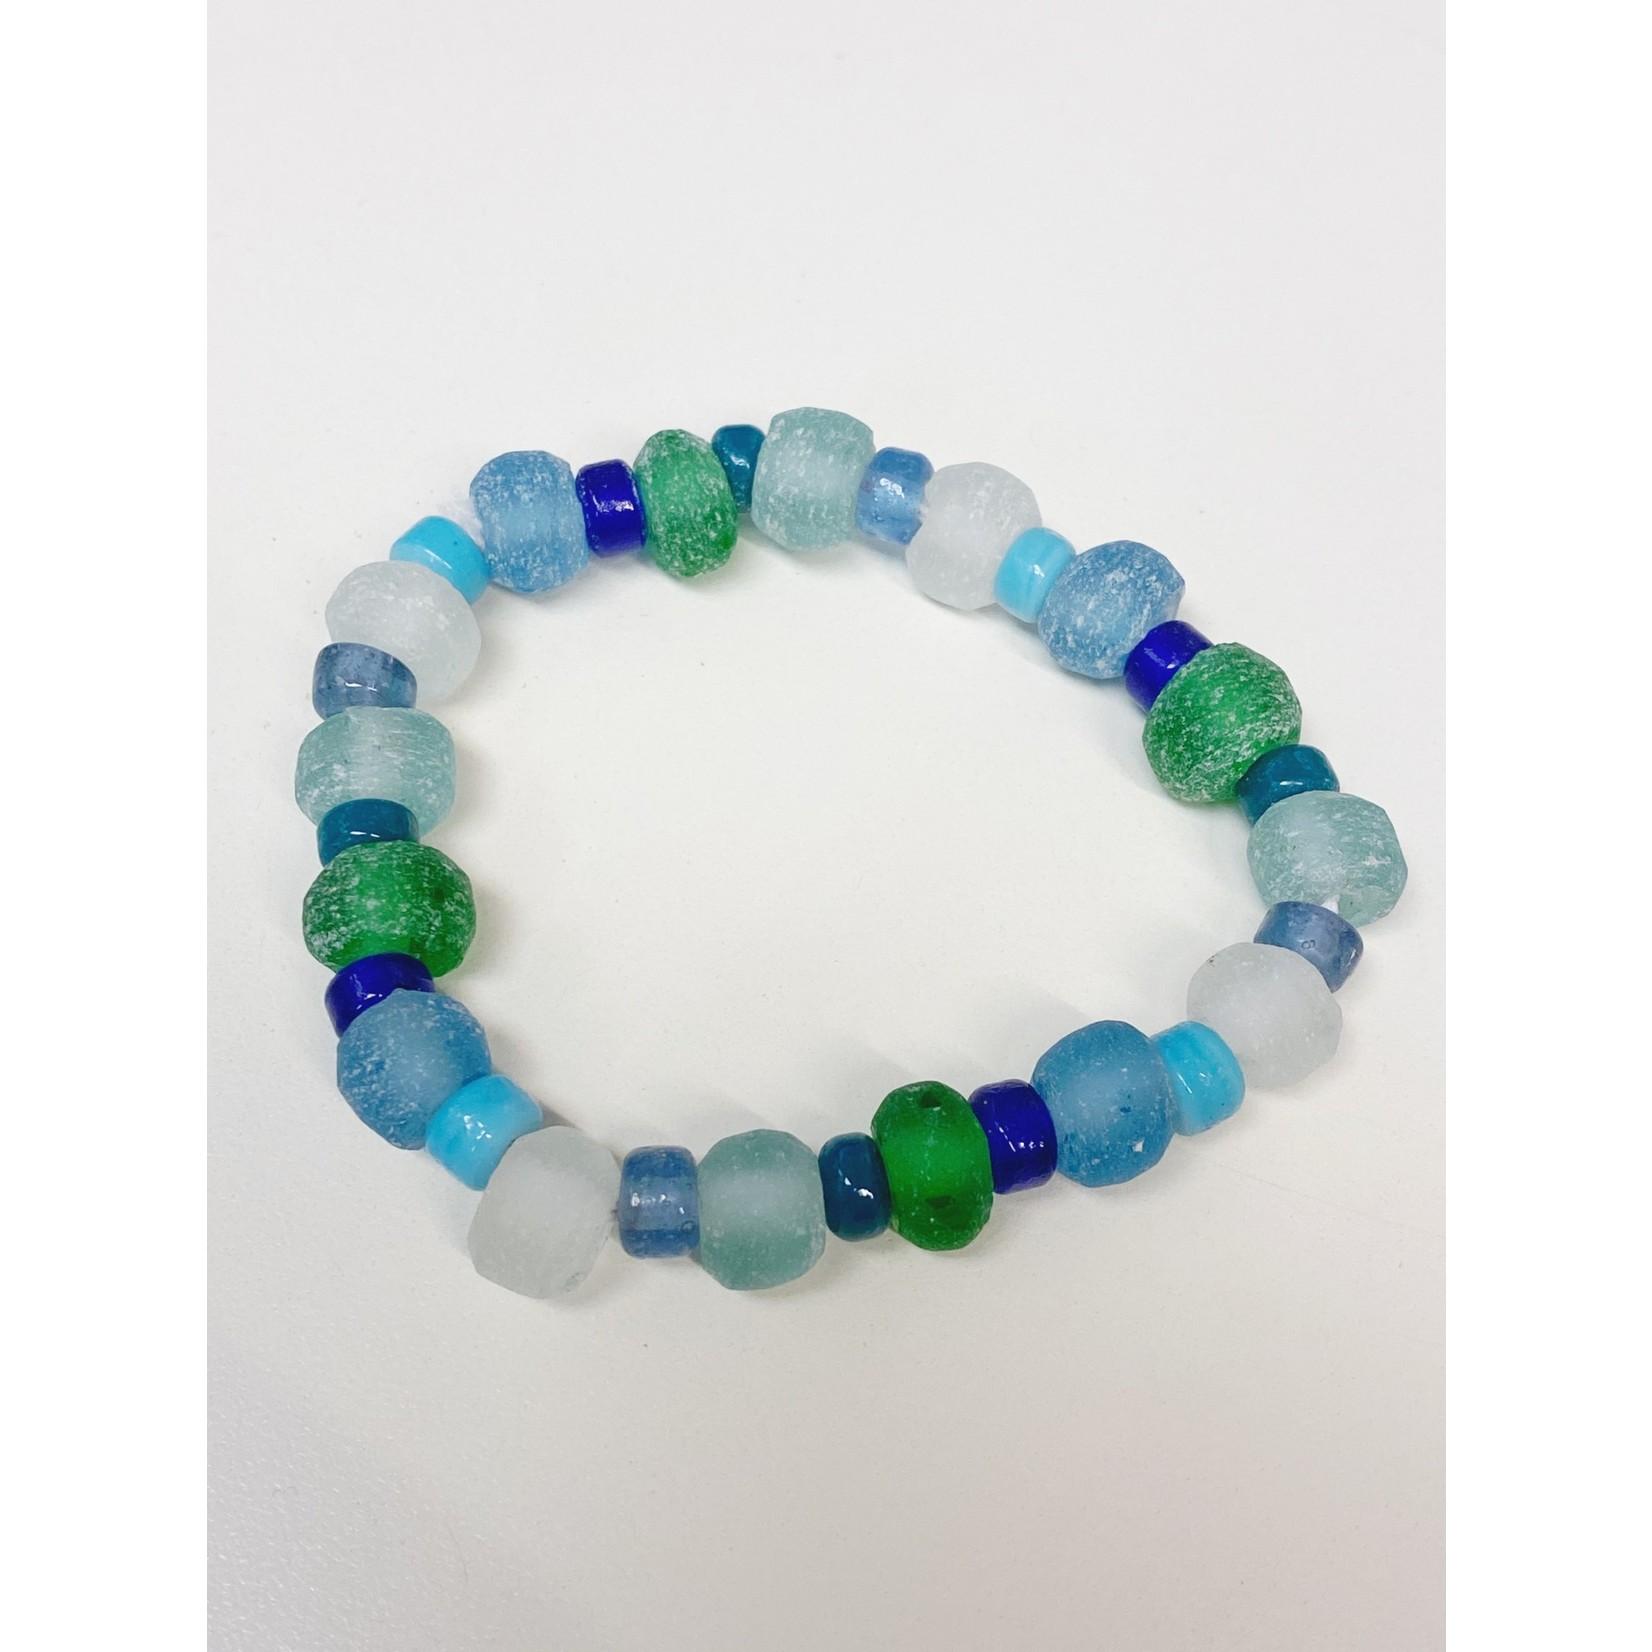 Maka Imports Original Glass Bracelet